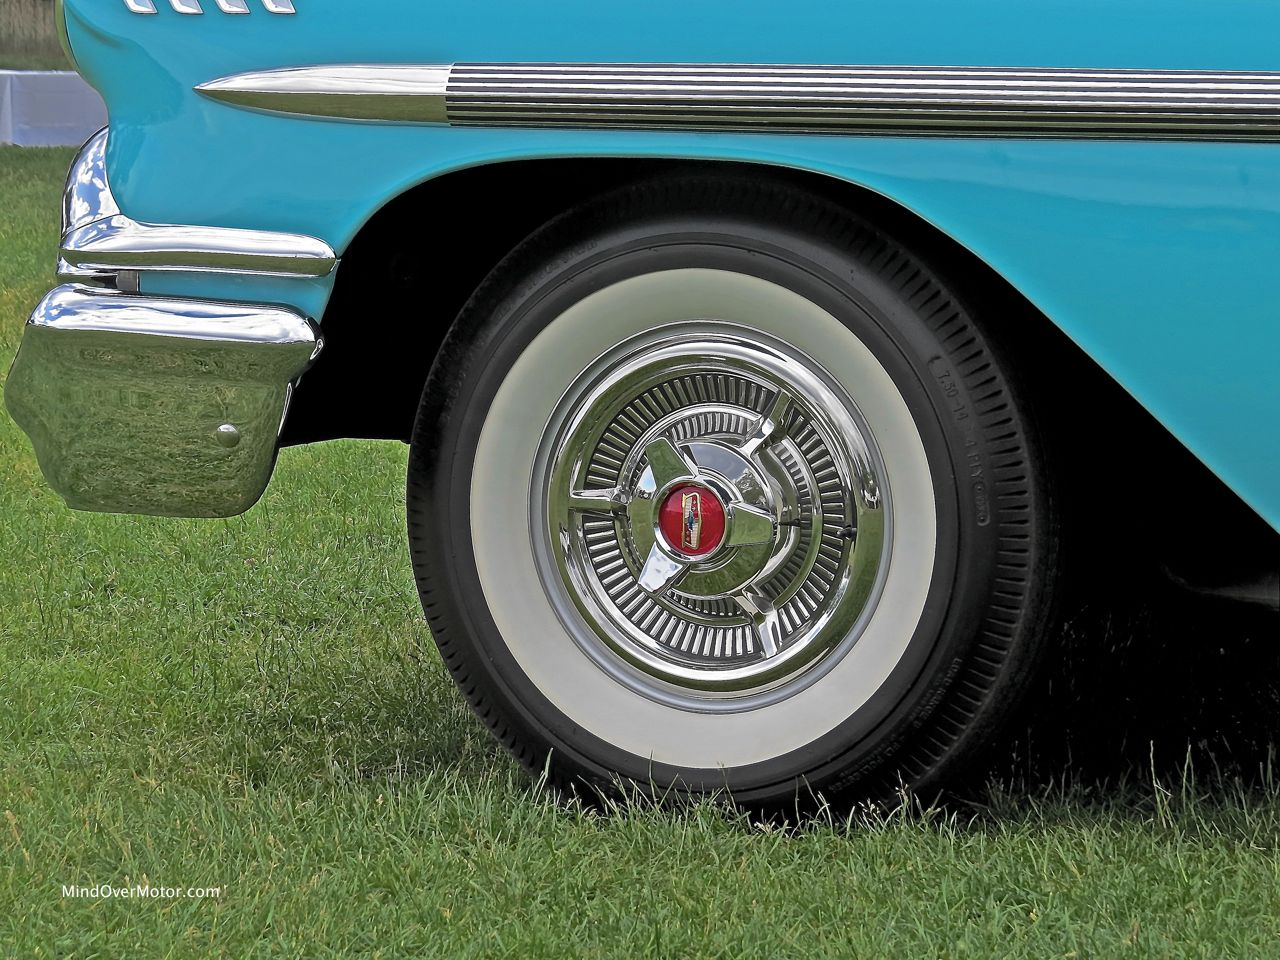 1958 Chevrolet Impala Wheel